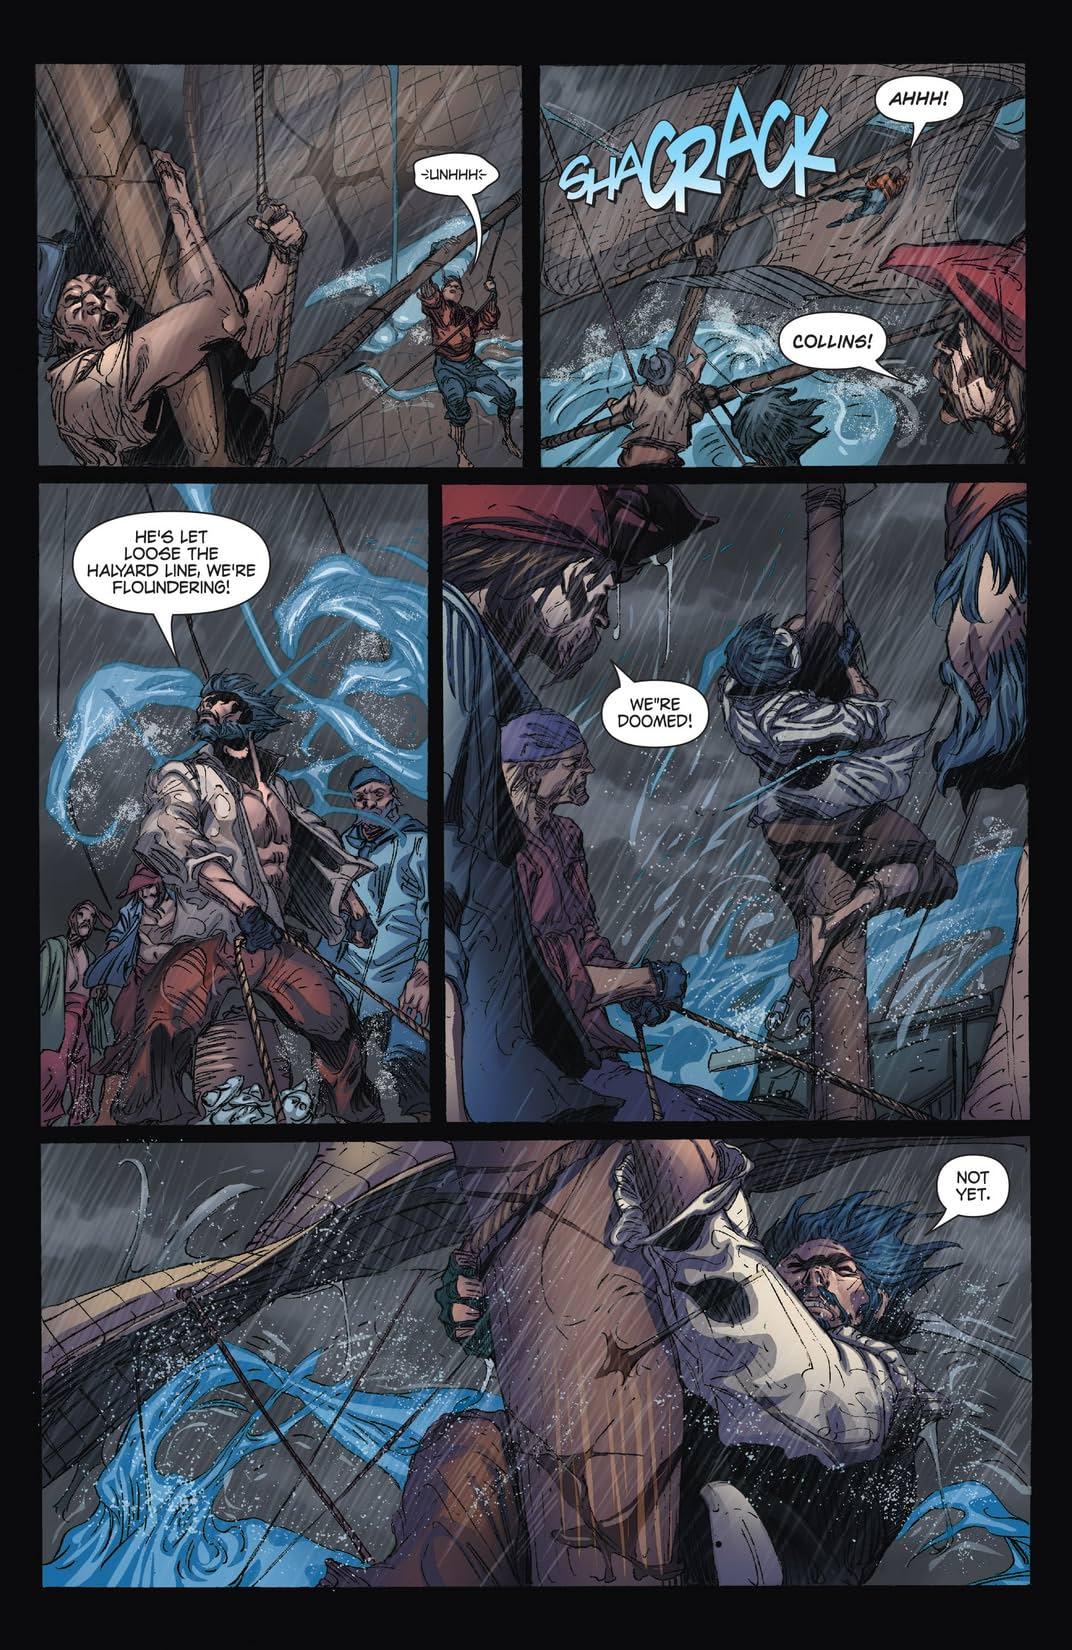 Blackbeard: Legend of the Pyrate King